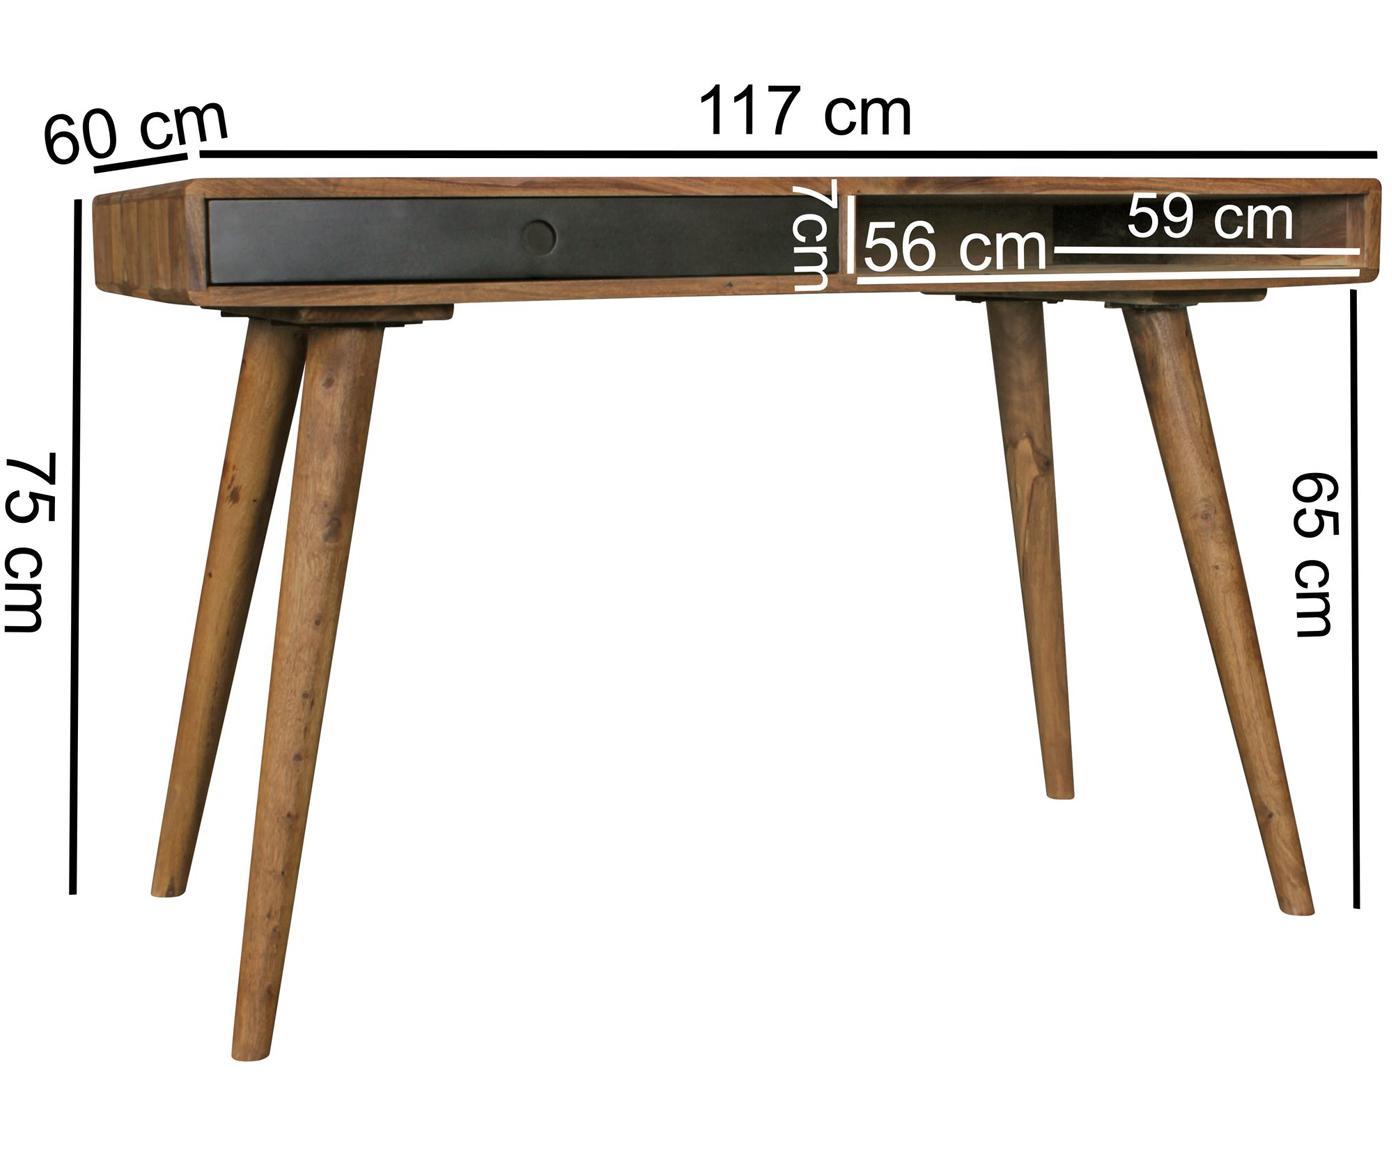 Bureau Repa uit massief hout, Sheesham hout, massief, gelakt,, Sheesham hout, zwart, B 117 x D 60 cm